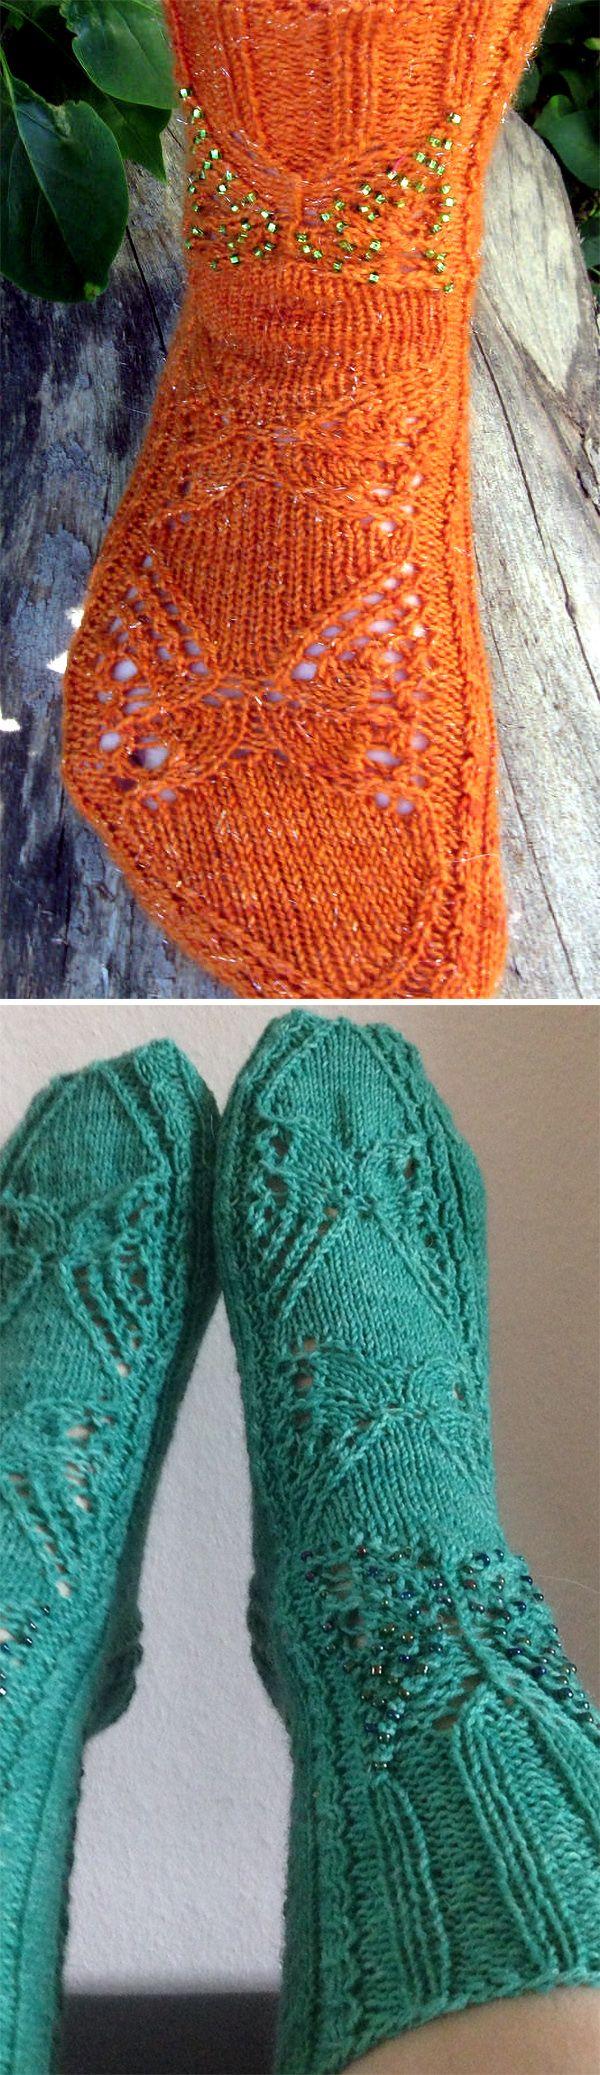 Free Knitting Pattern for Butterfly Socks - These socks ...